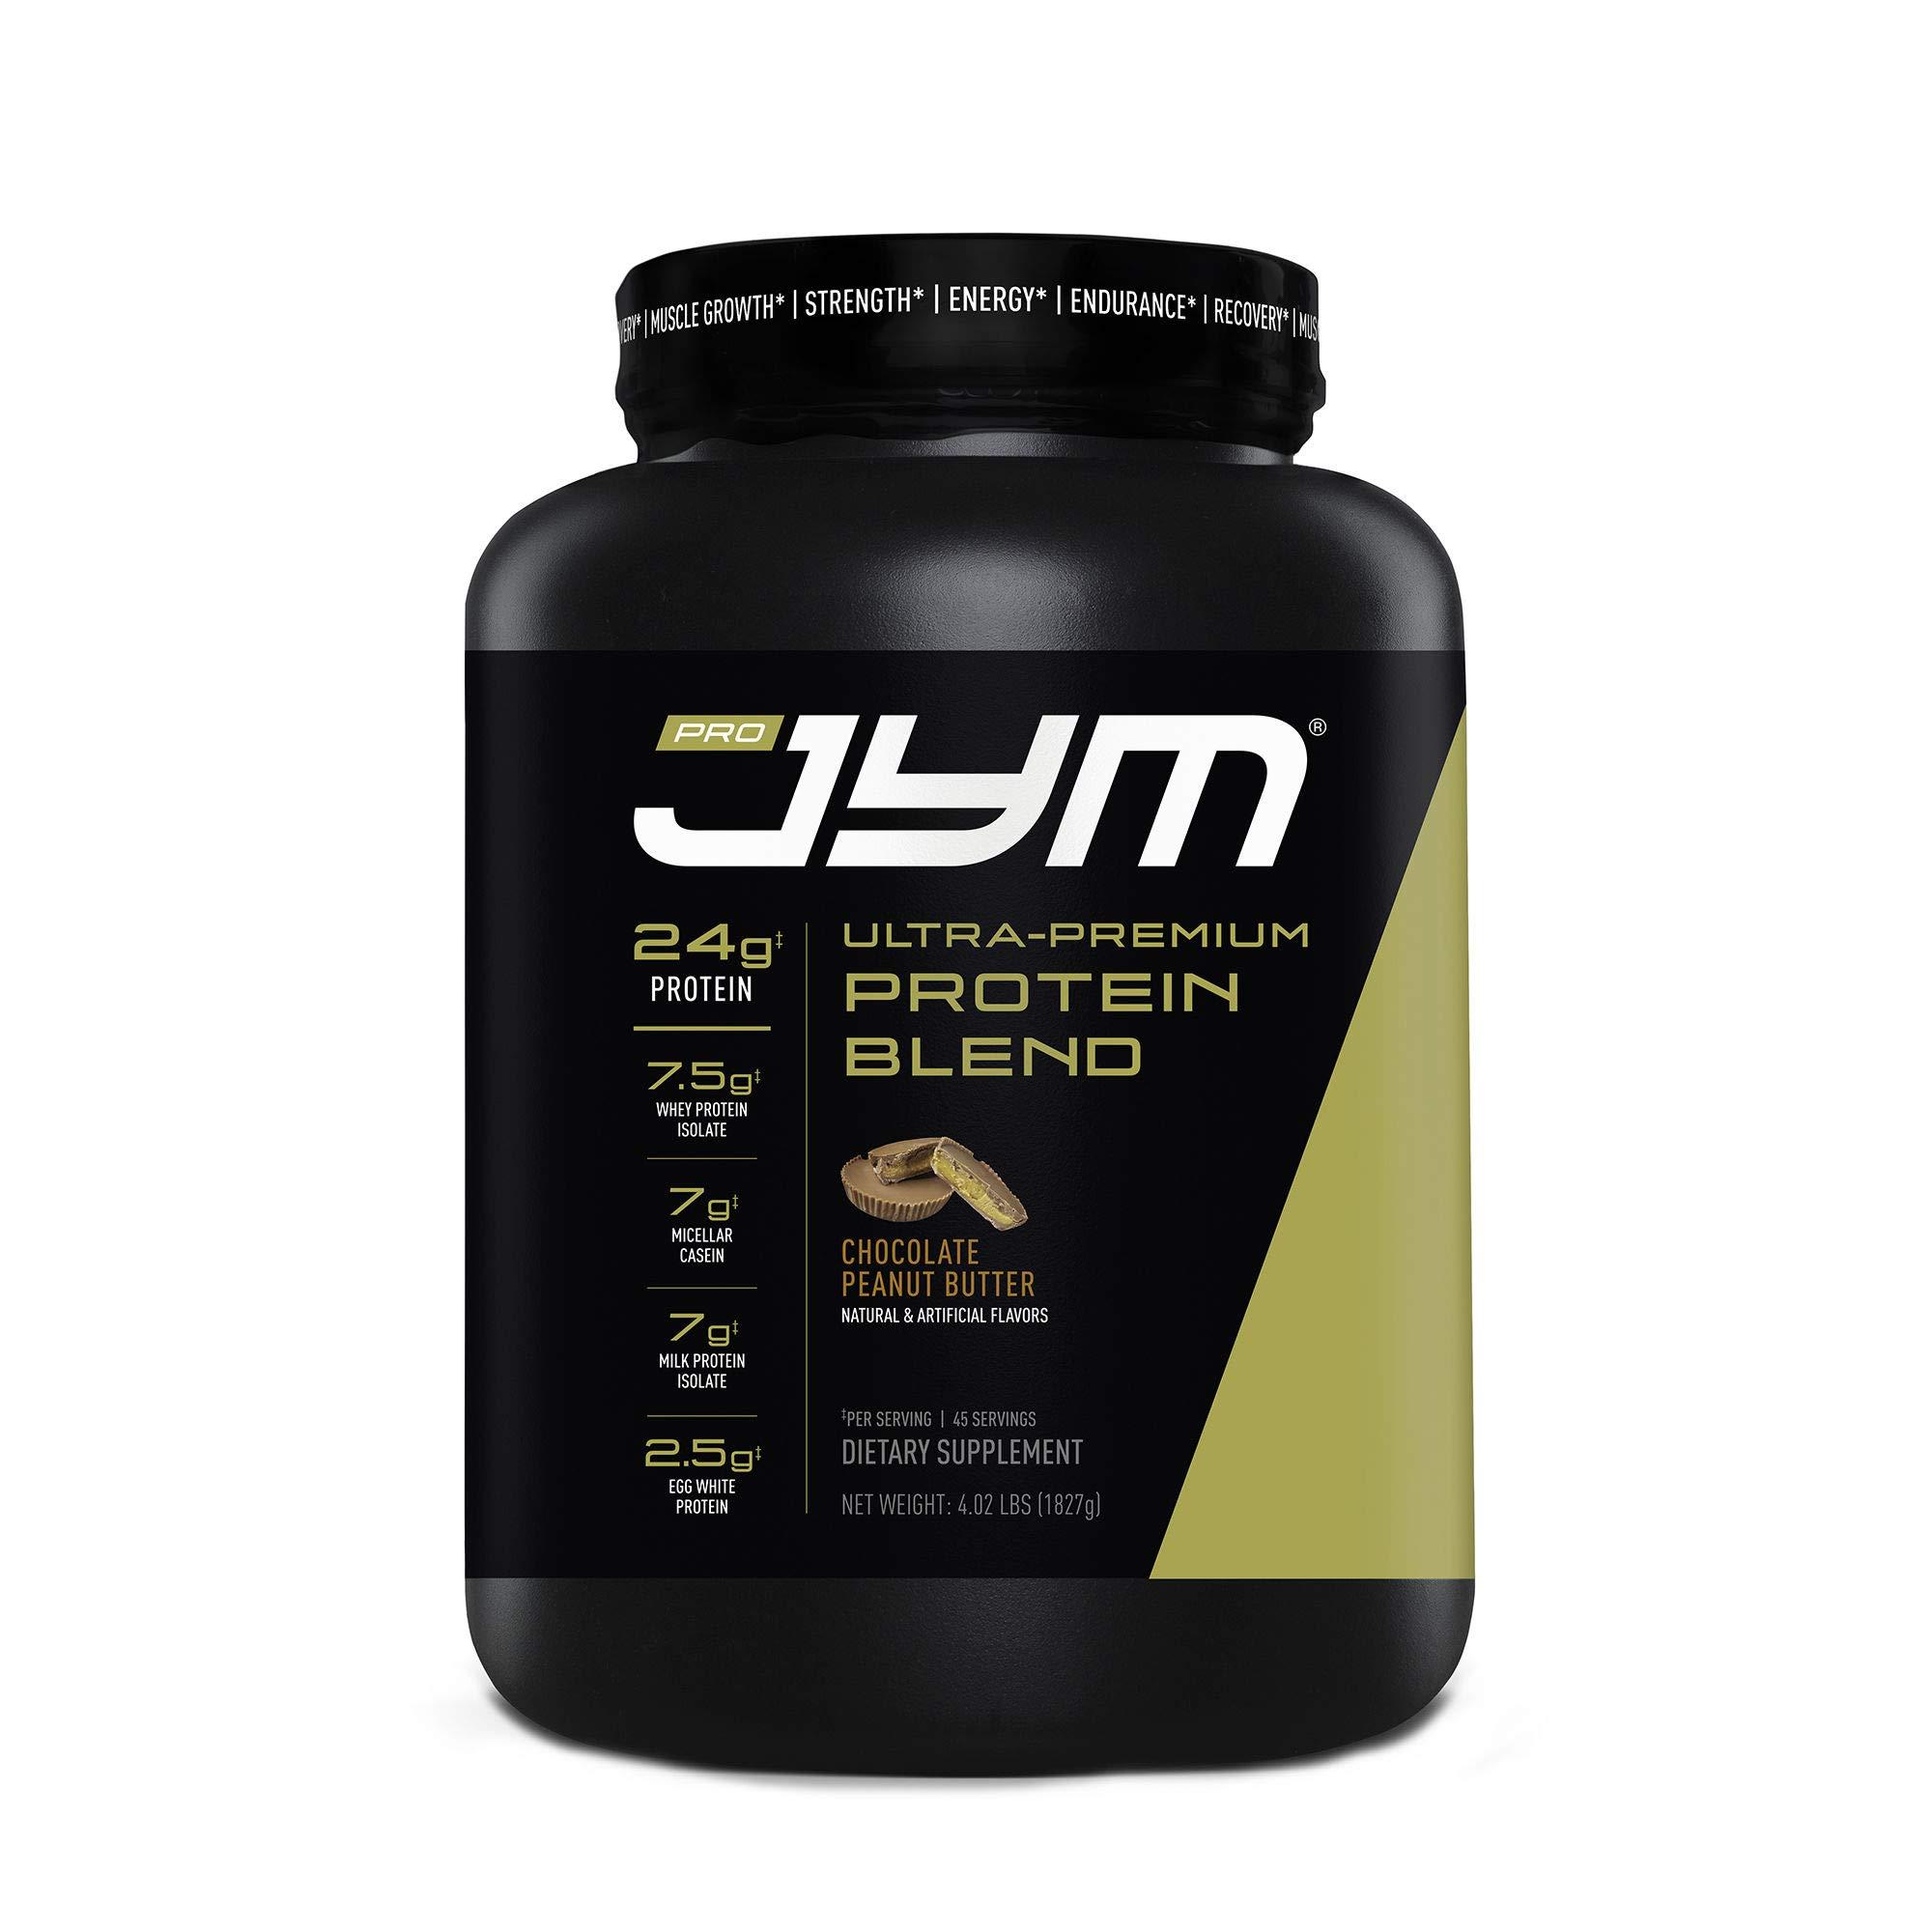 Pro Jym Protein Blend - Chocolate Peanut Butter